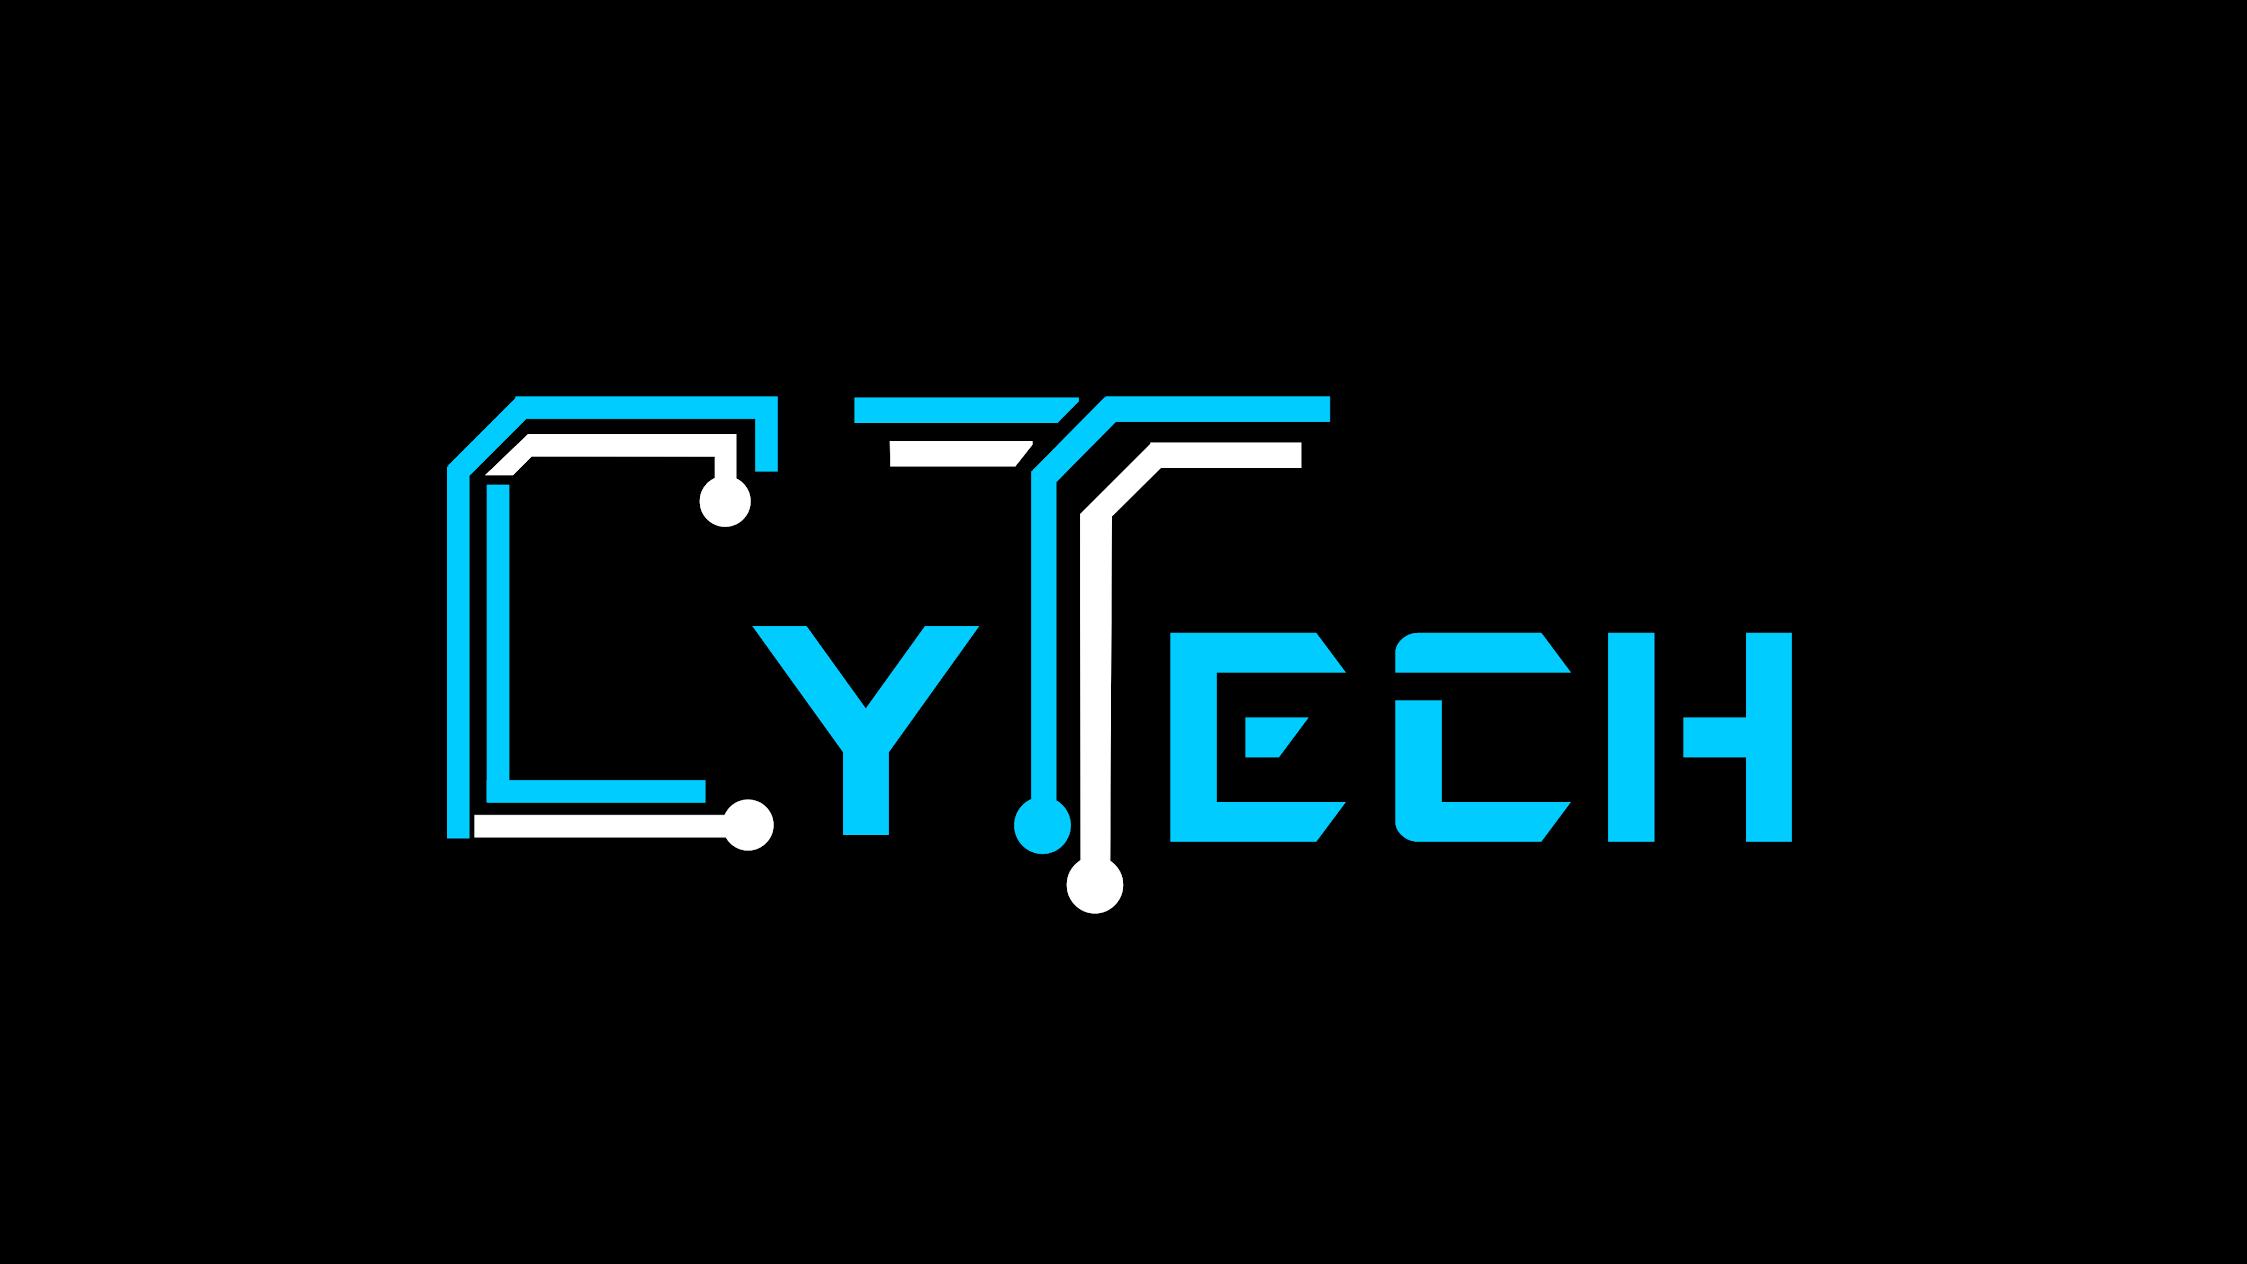 CyTech